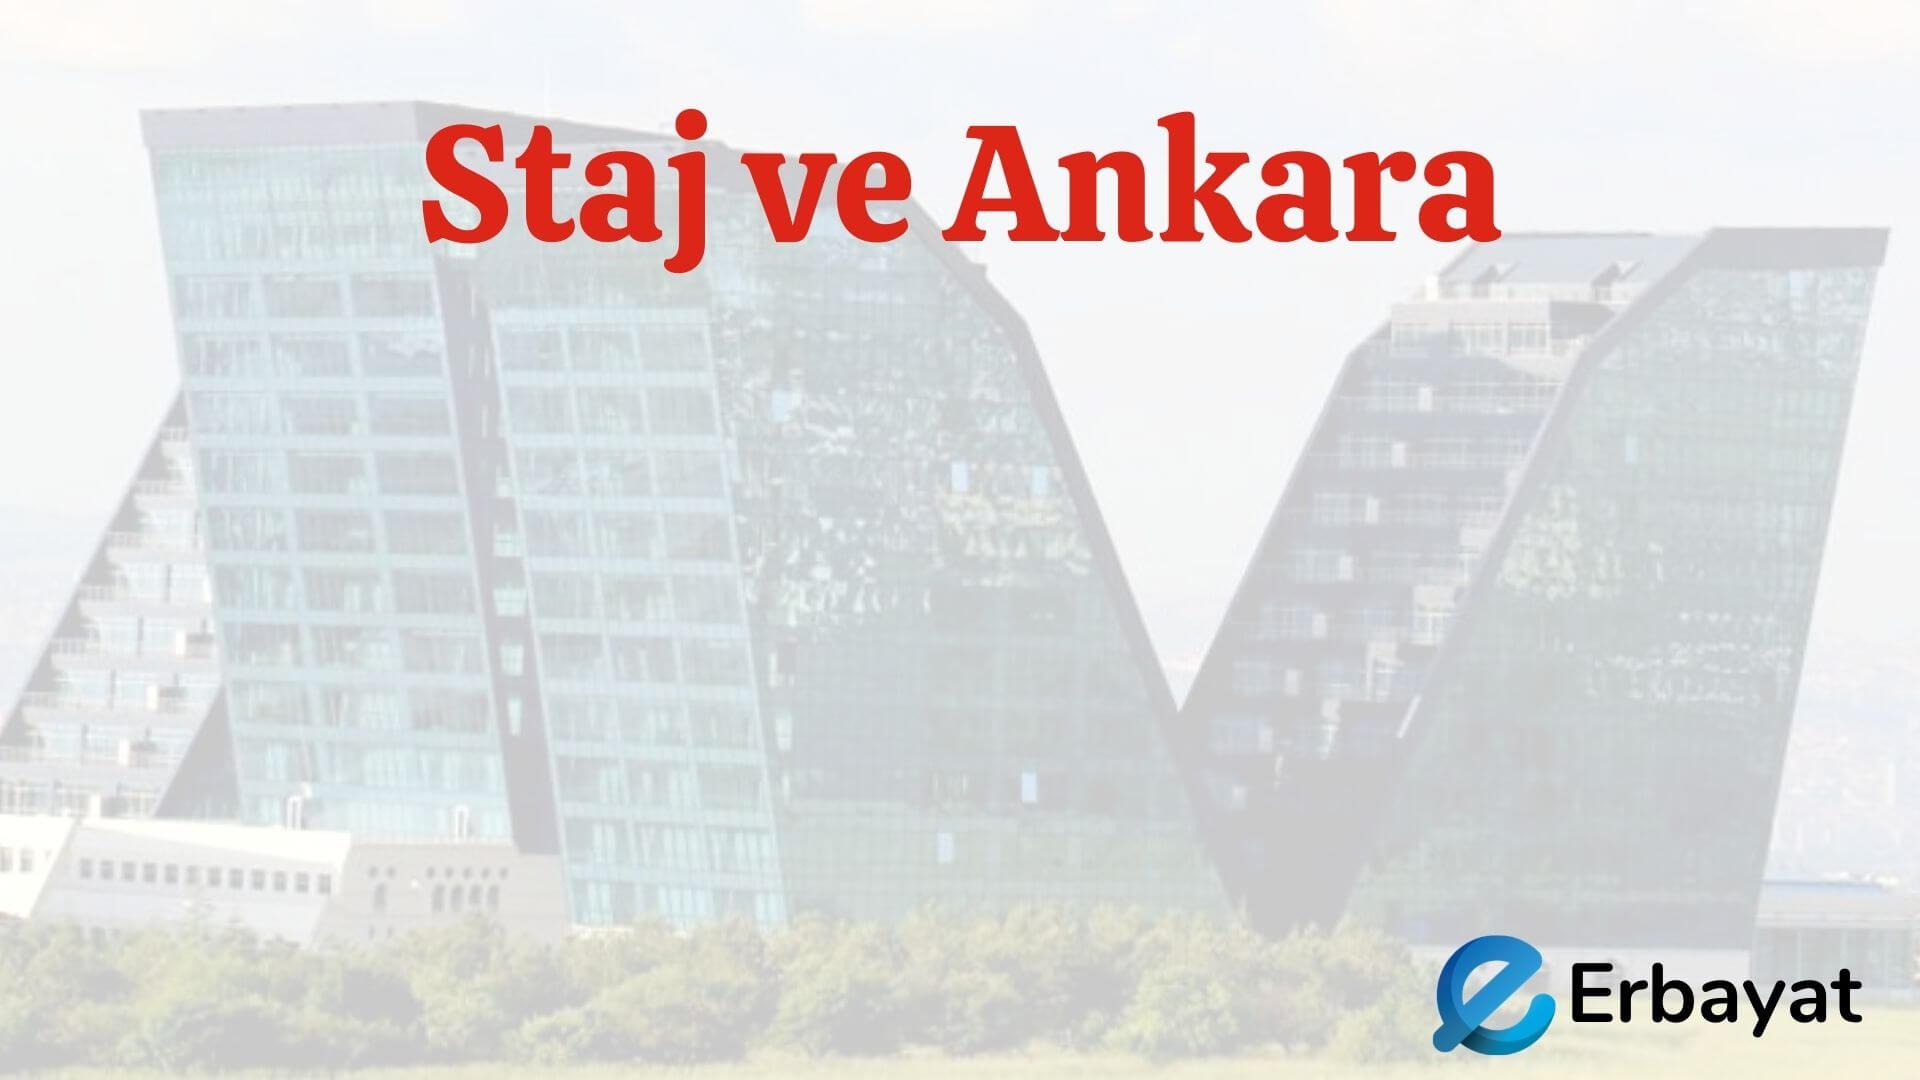 Staj ve Ankara